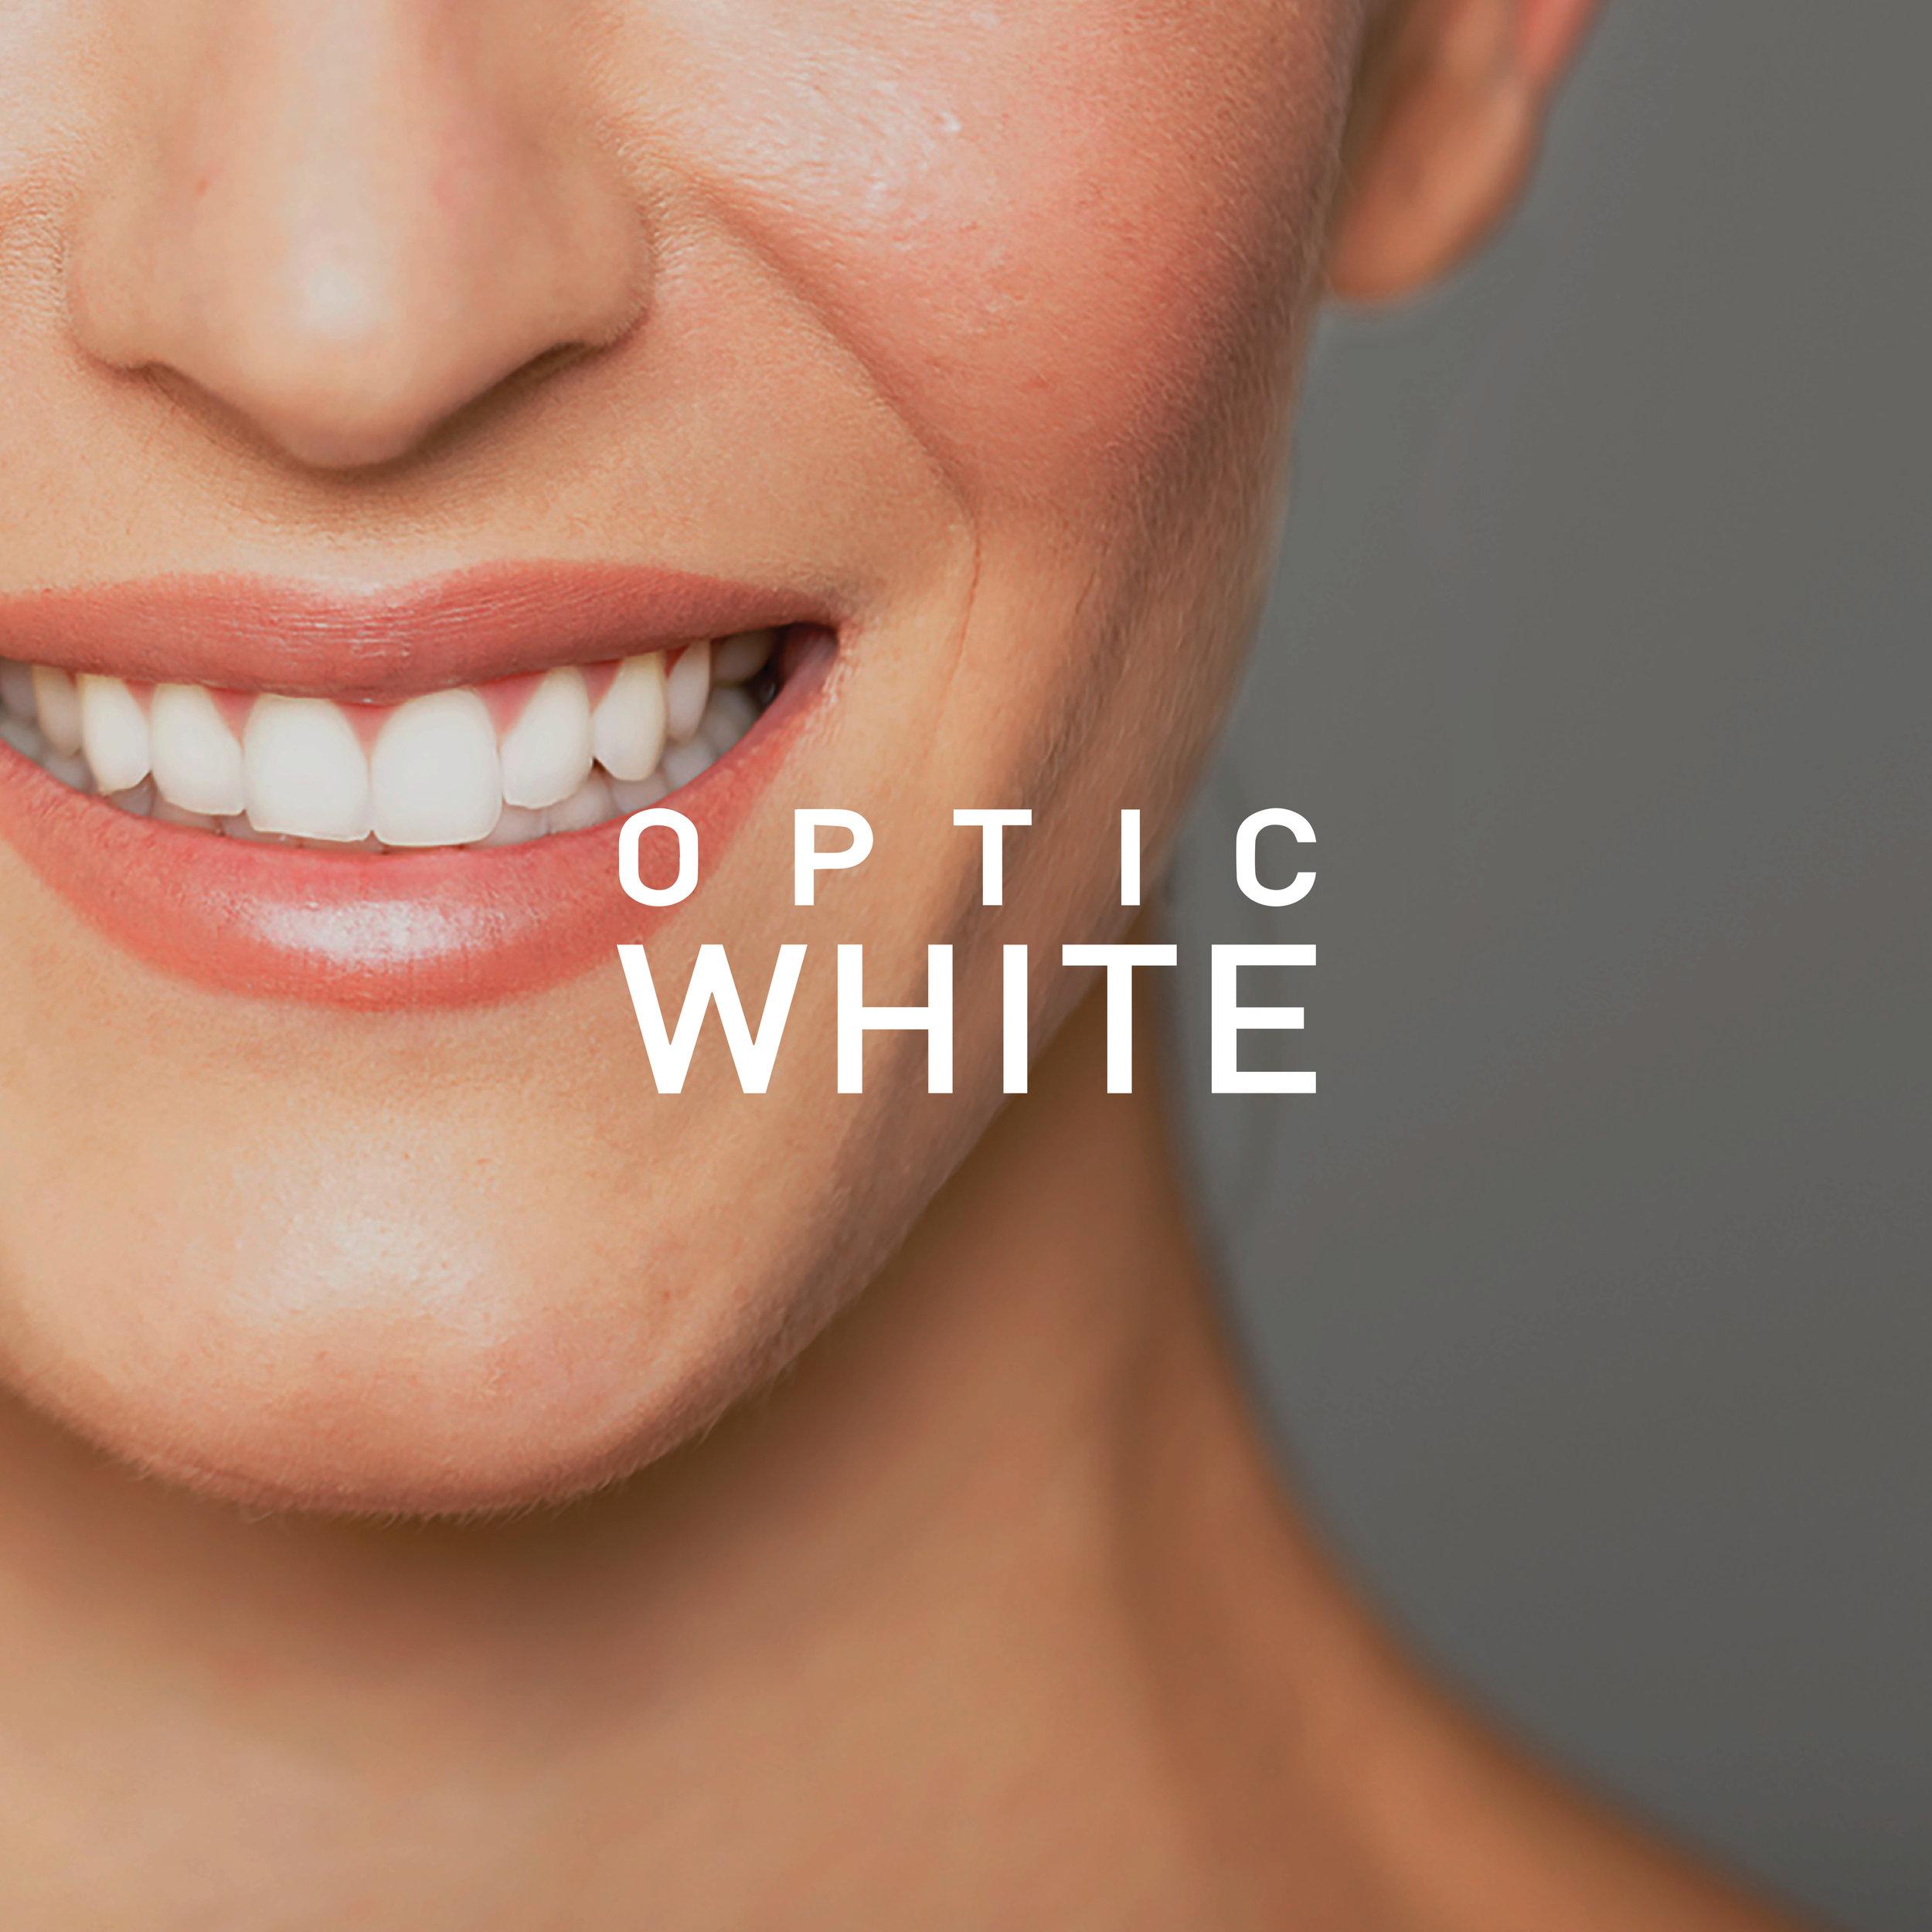 Optic White (Colgate)